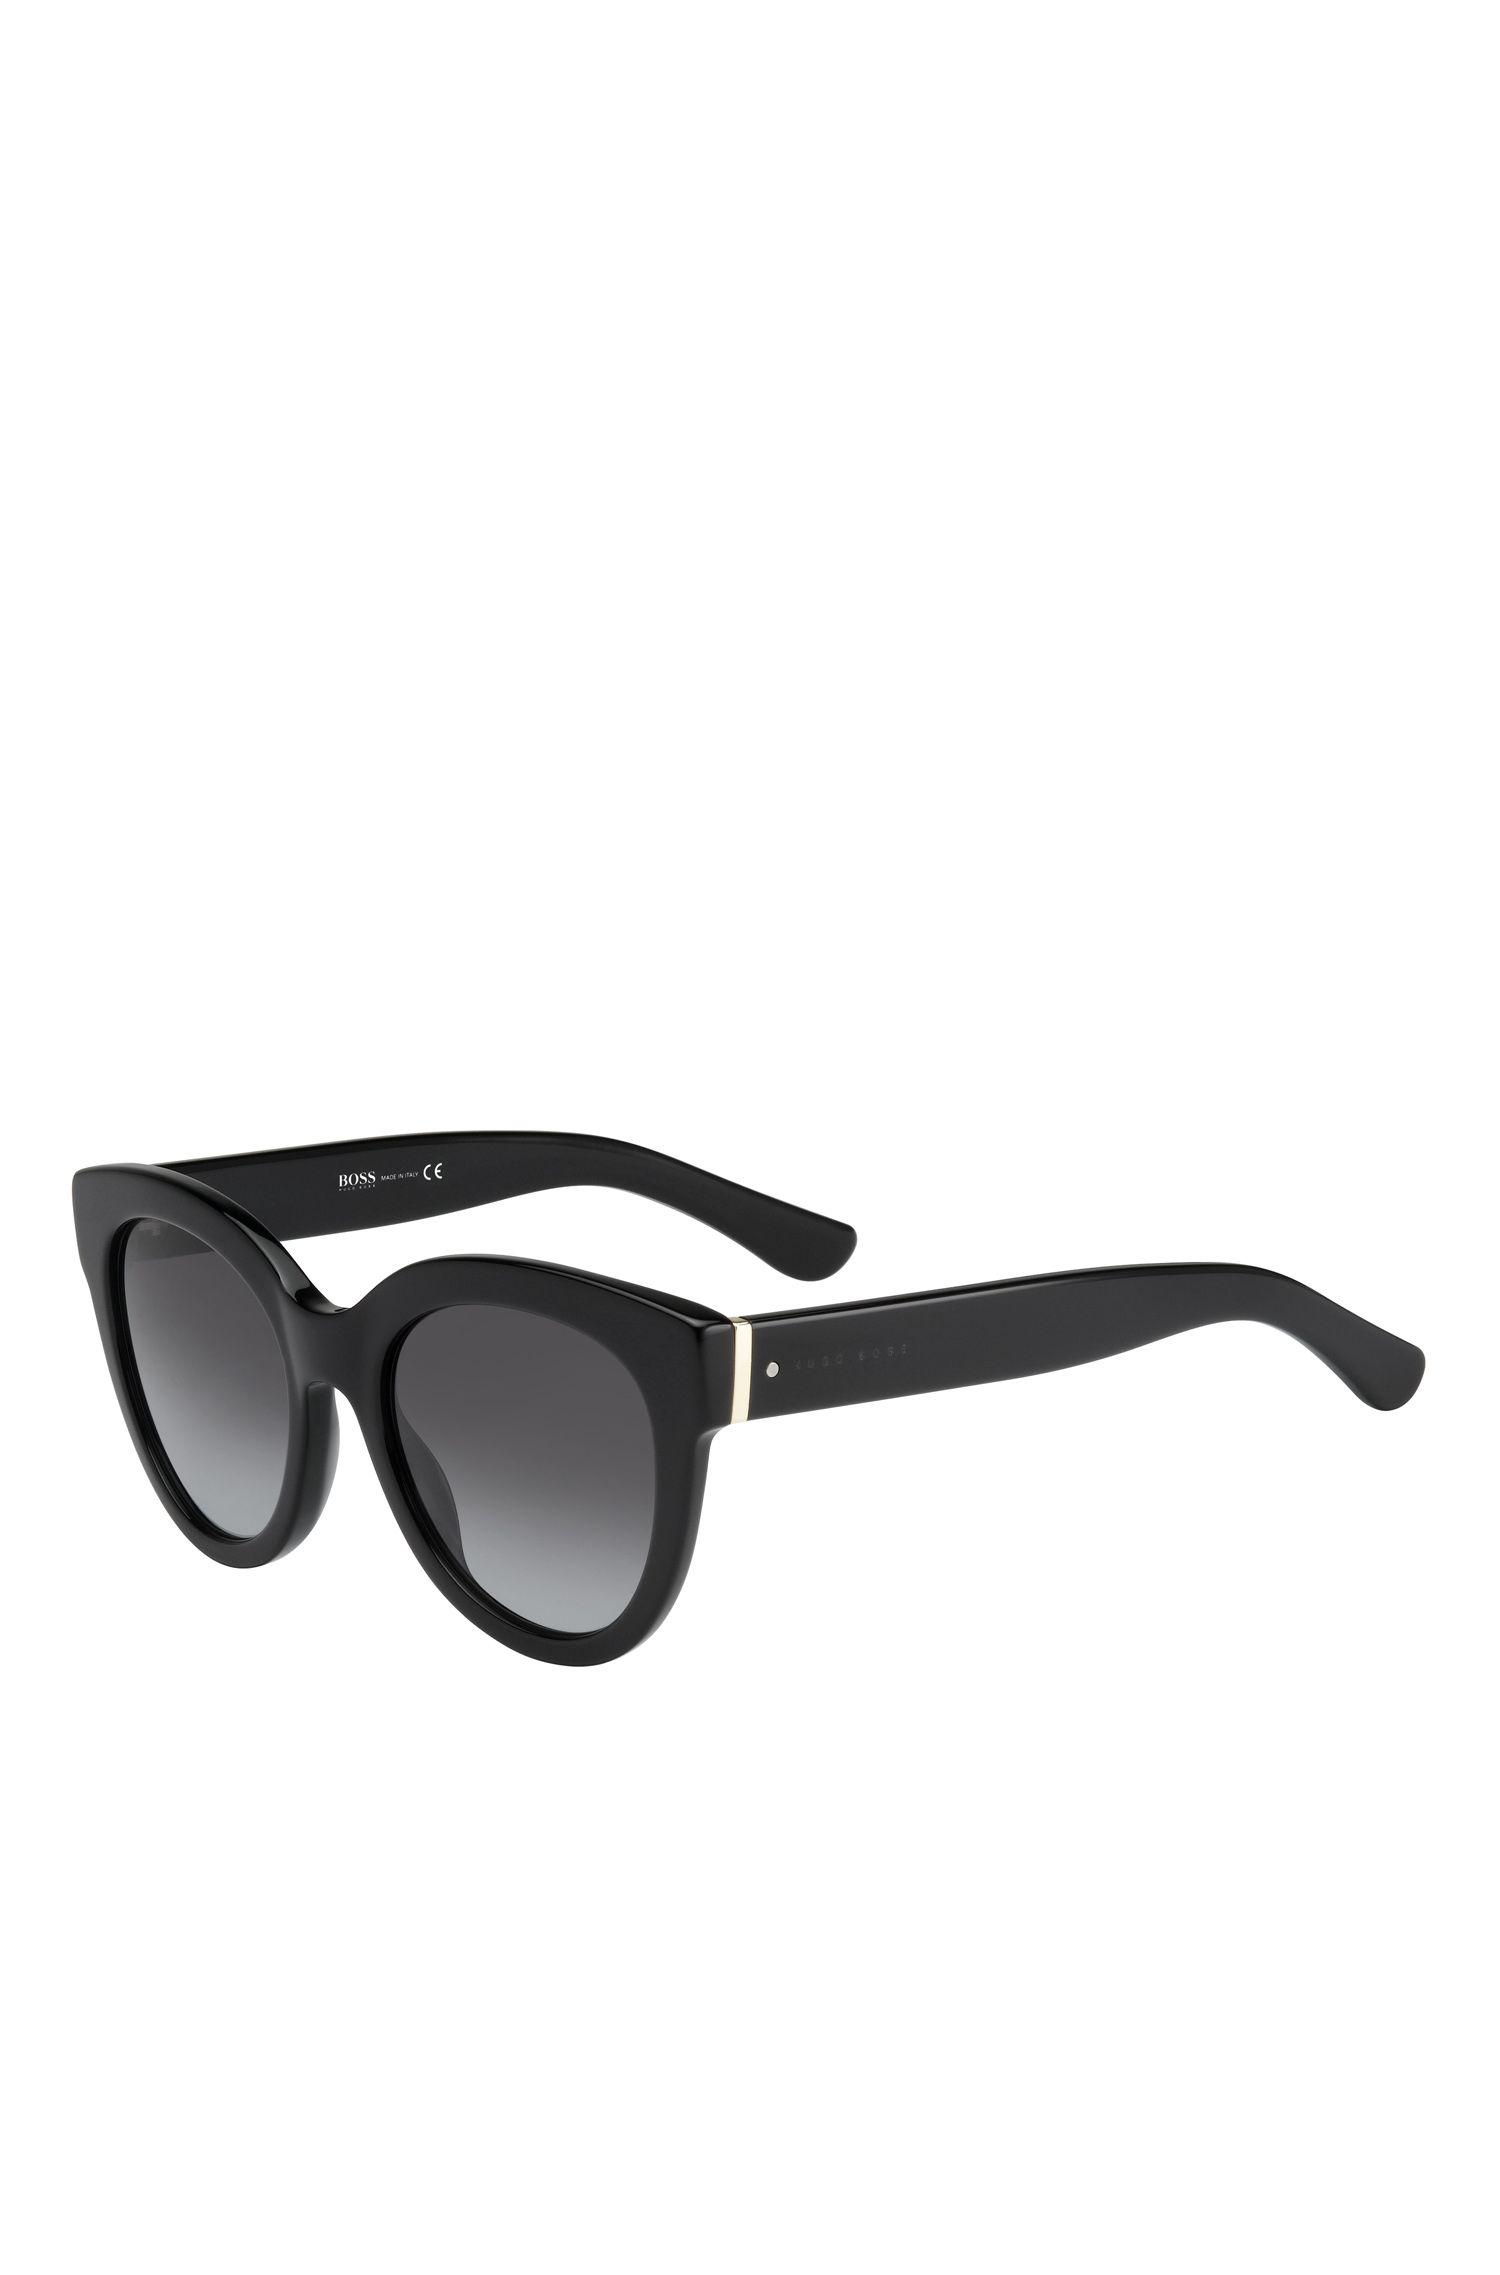 Black Gradient Lens Cateye Sunglasses | BOSS 0675S